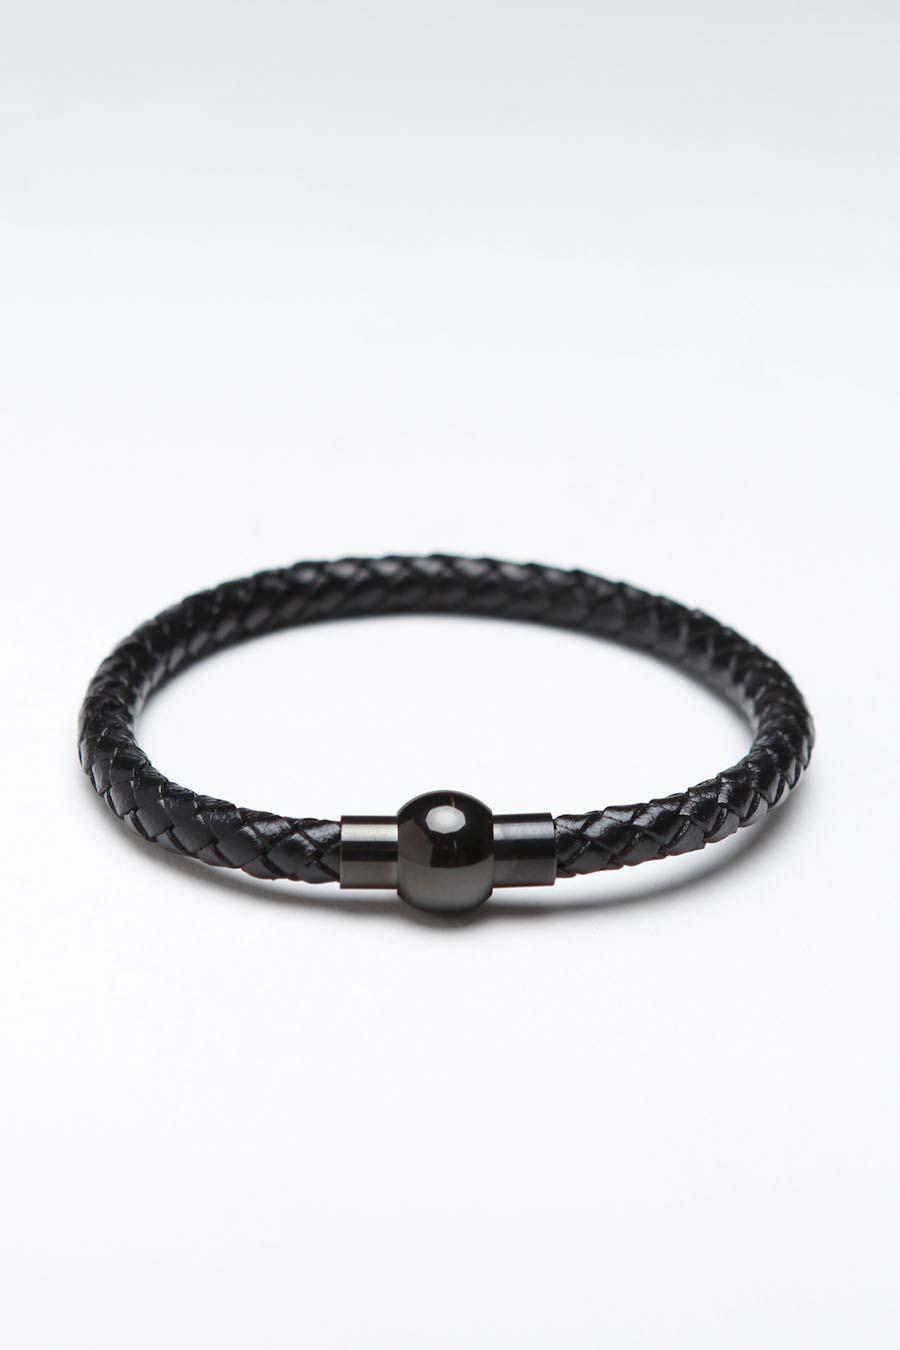 Black leather cord bracelet my types pinterest leather cord